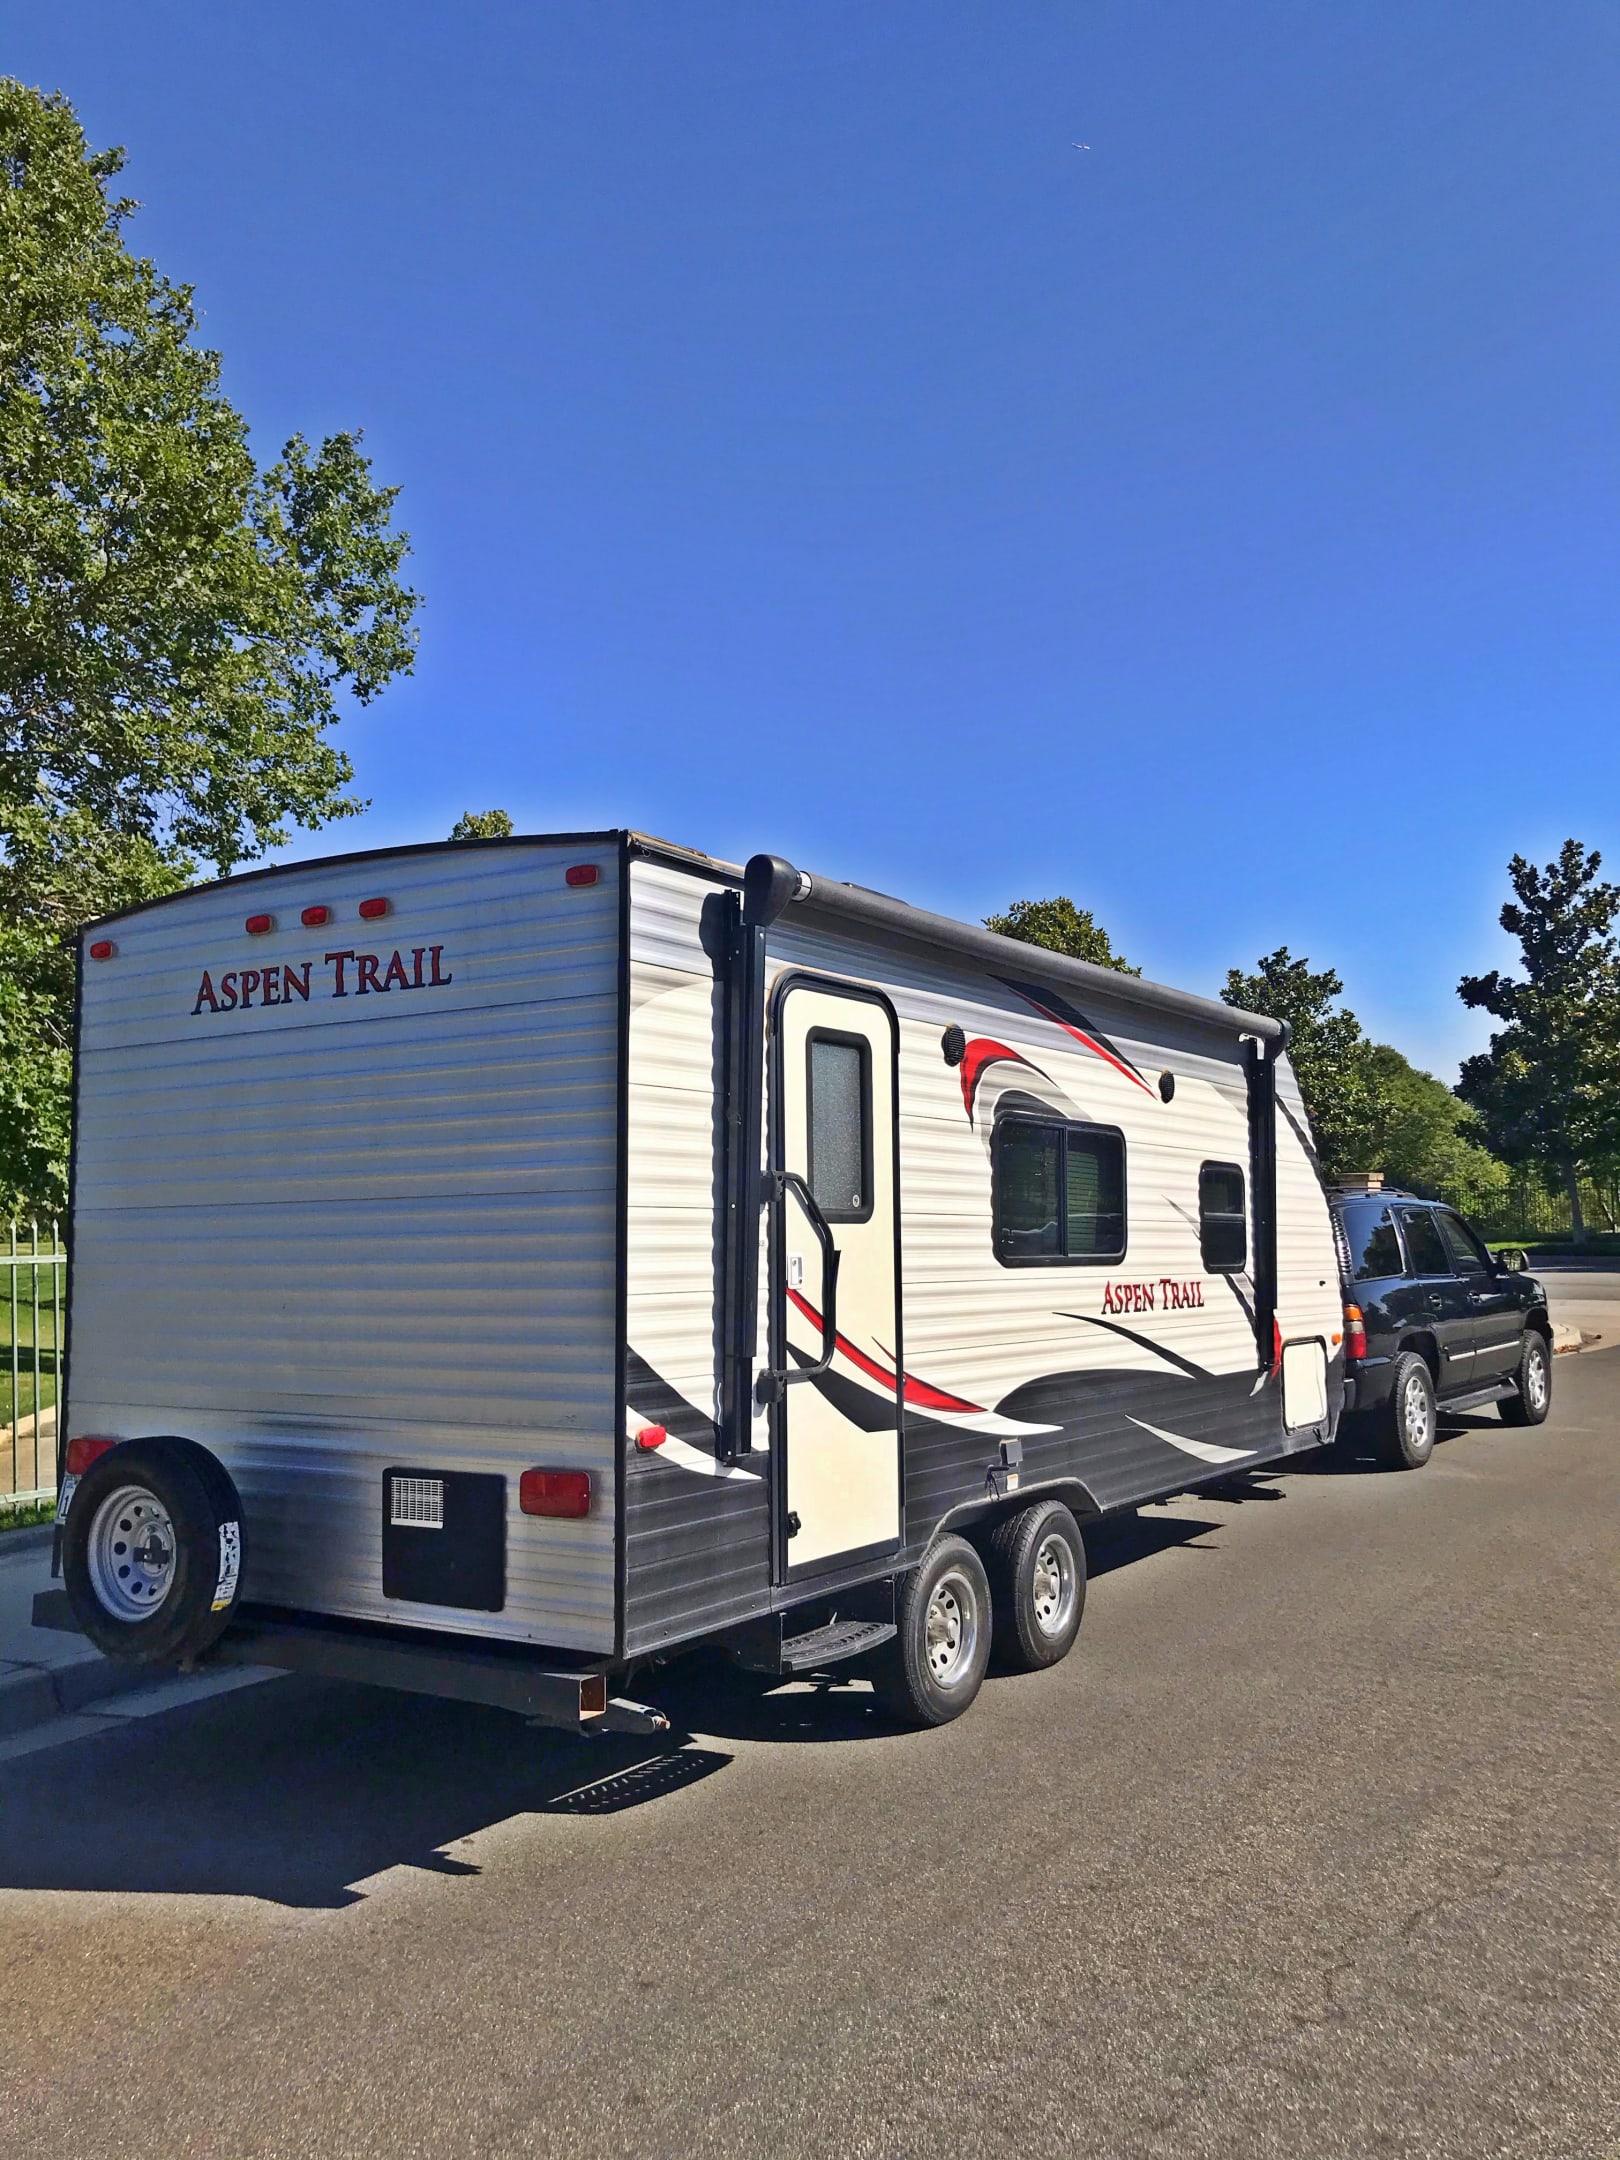 Best Fontana Travel Trailer Camper for Rent Rental. Dutchmen Aspen Trail 2015